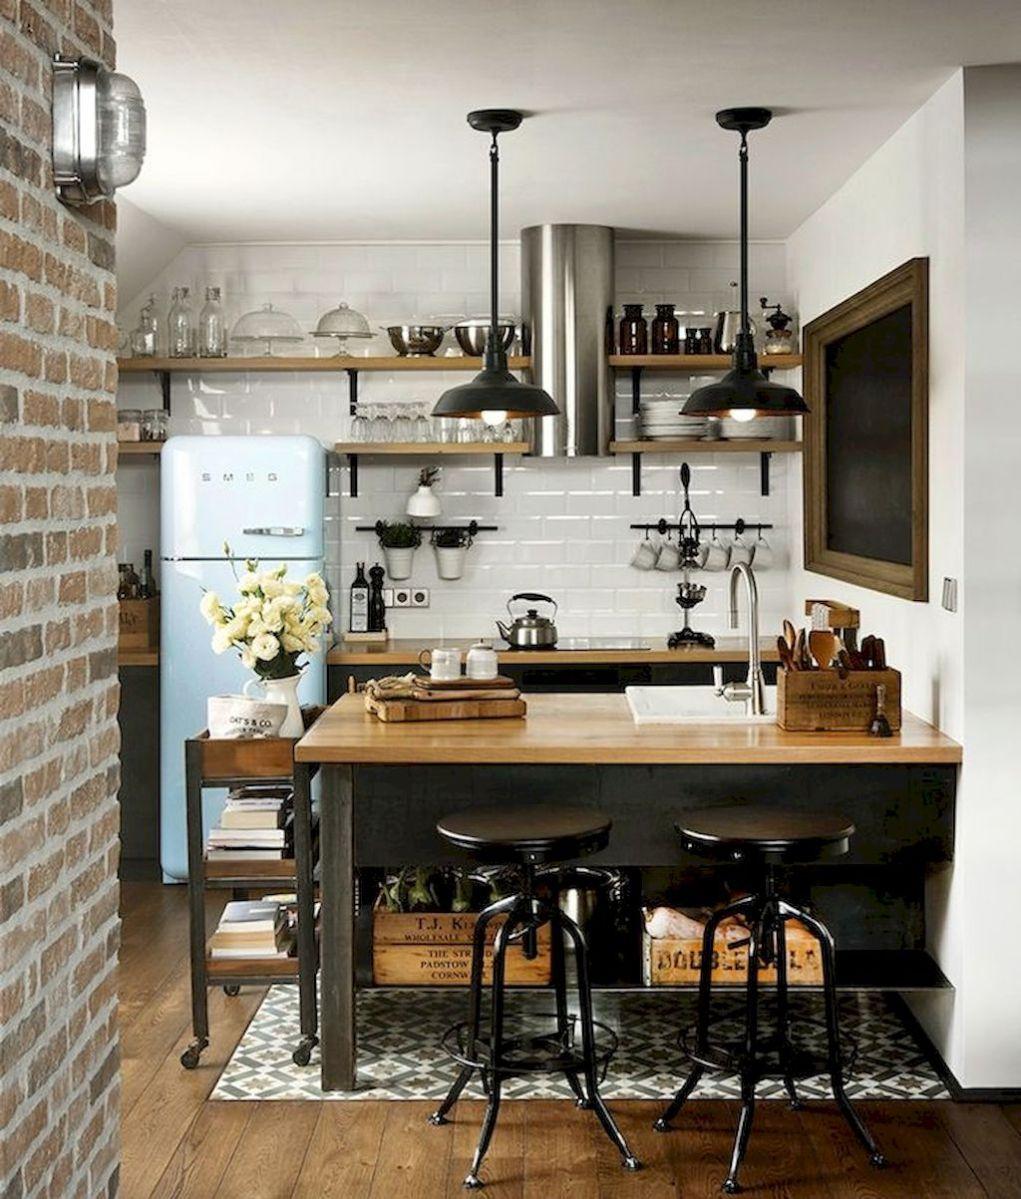 Beautiful kitchen decor ideas on a budget (23